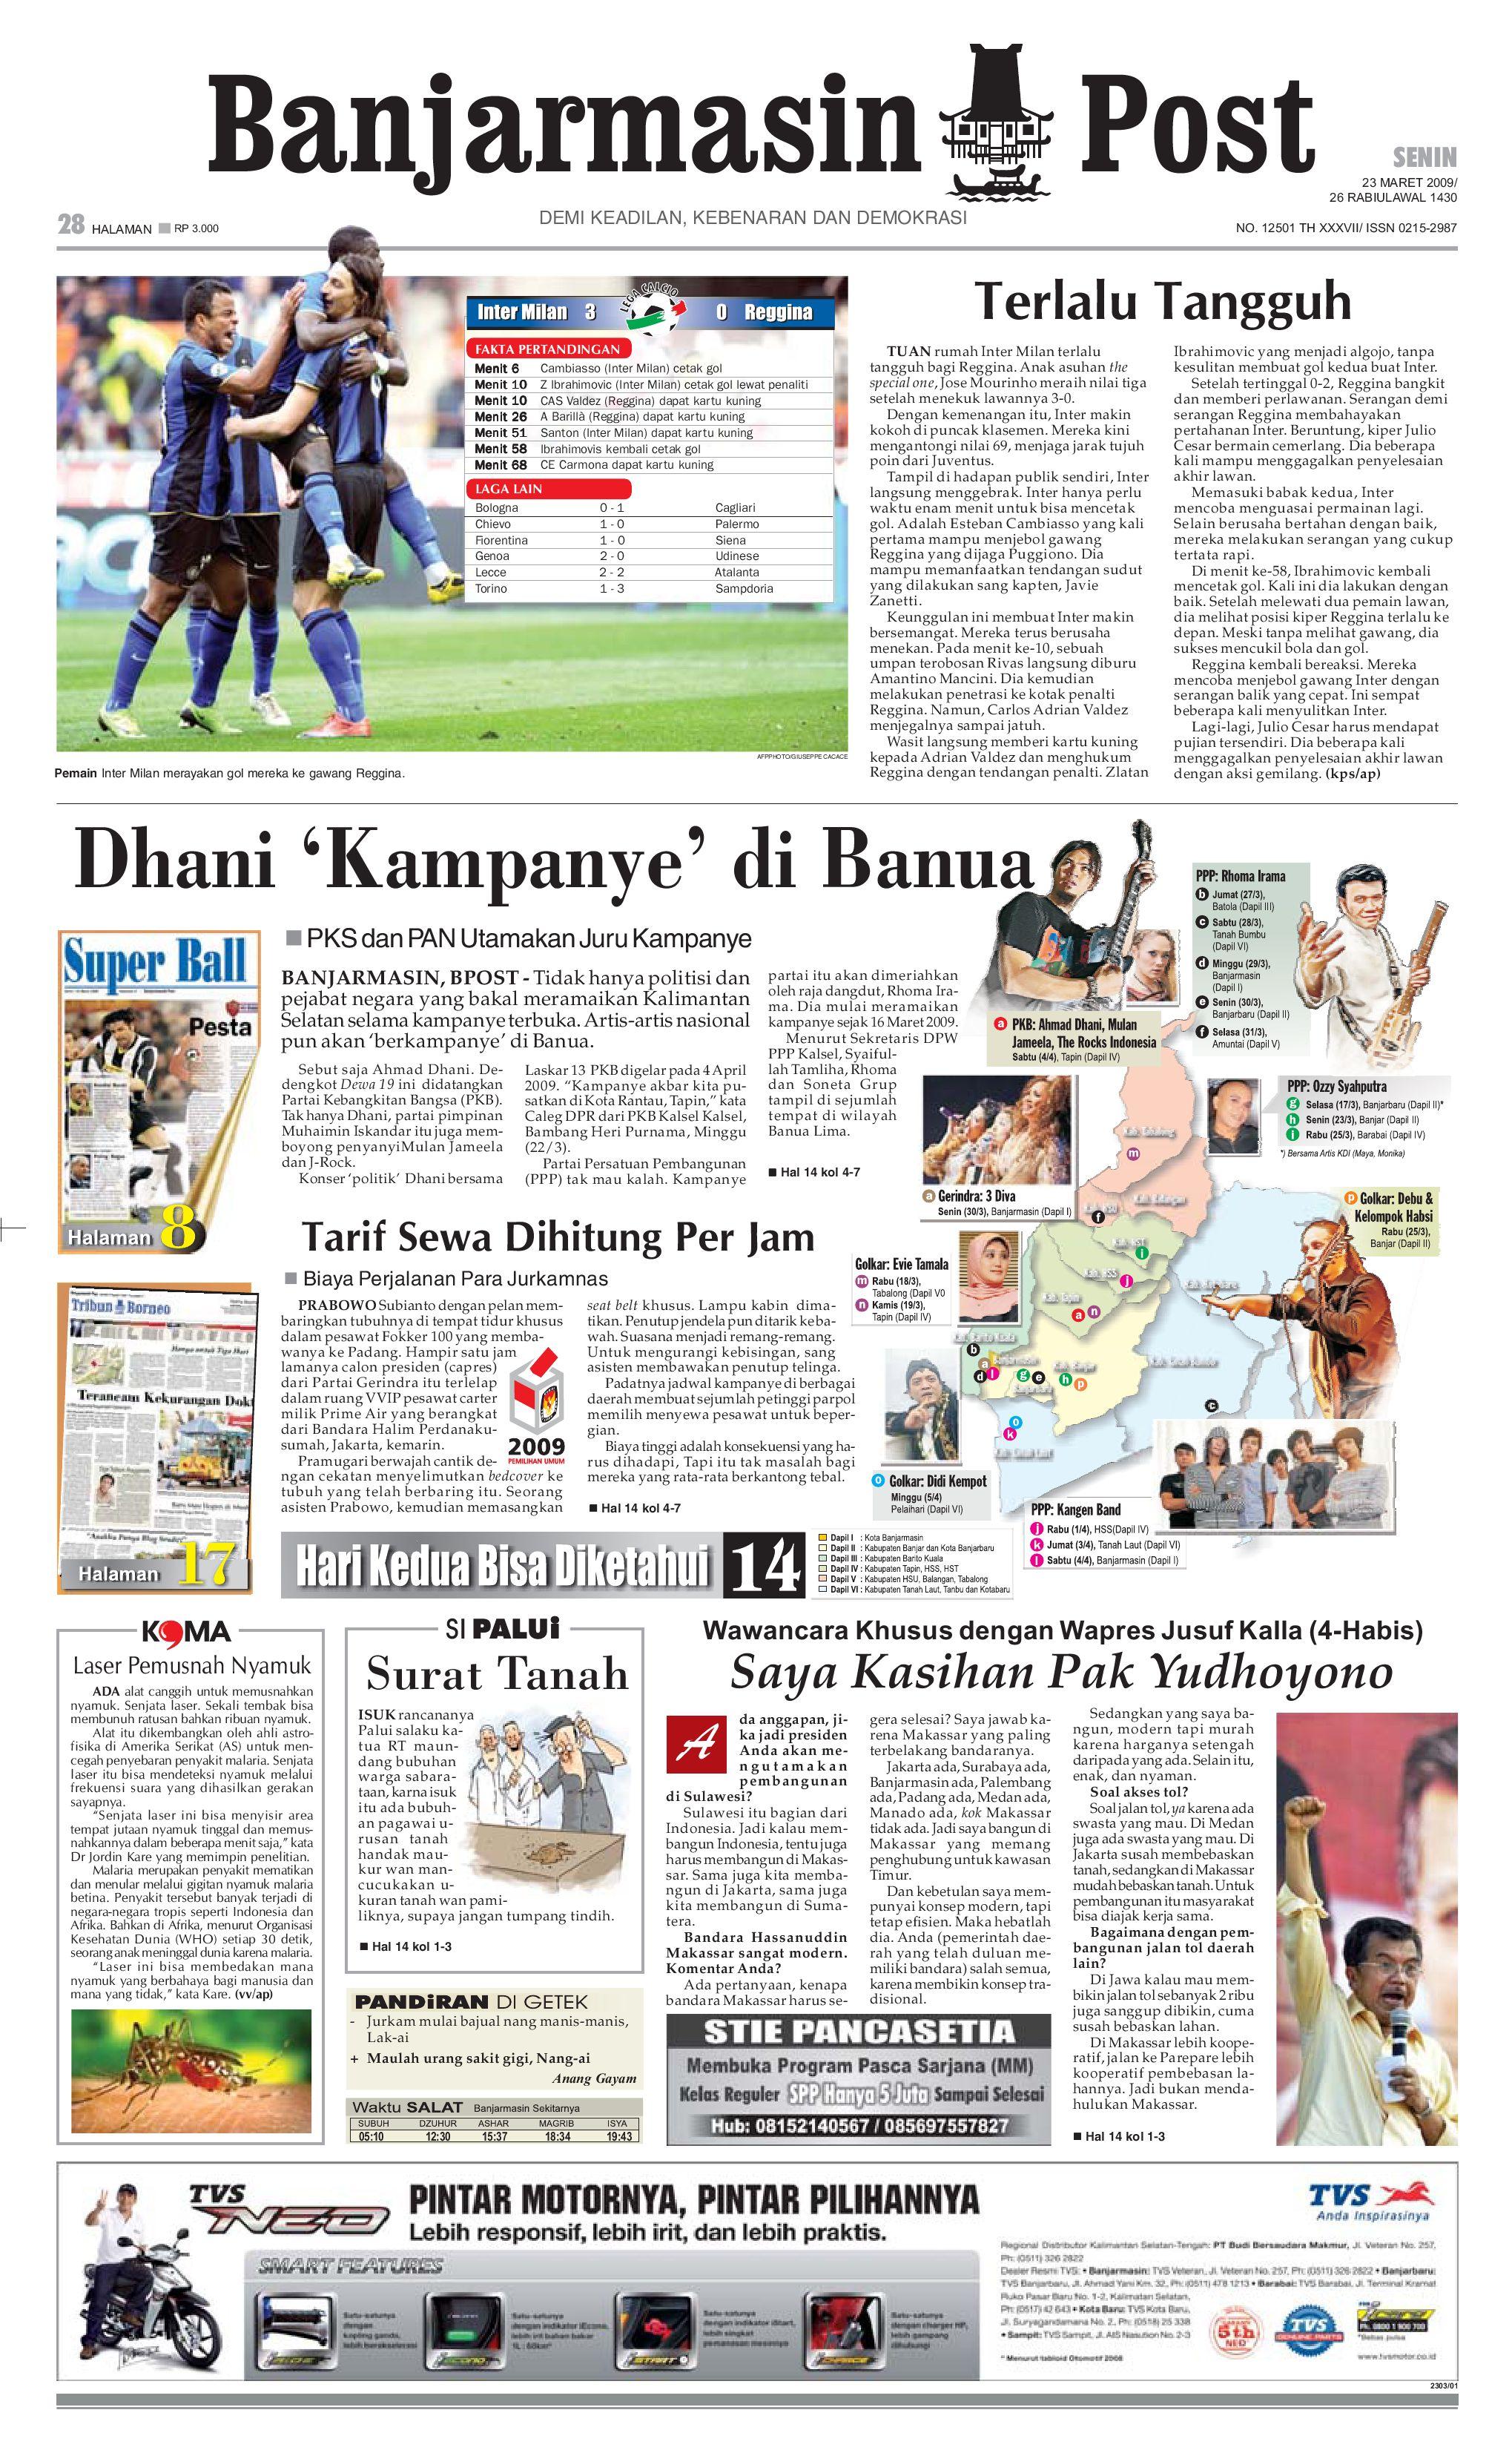 Fcenter Solo Sofa L Putus Estillo Jawa Tengah Dan Diy Jatim Harga Sofabed Recklening Timur Lavender Yogyakarta